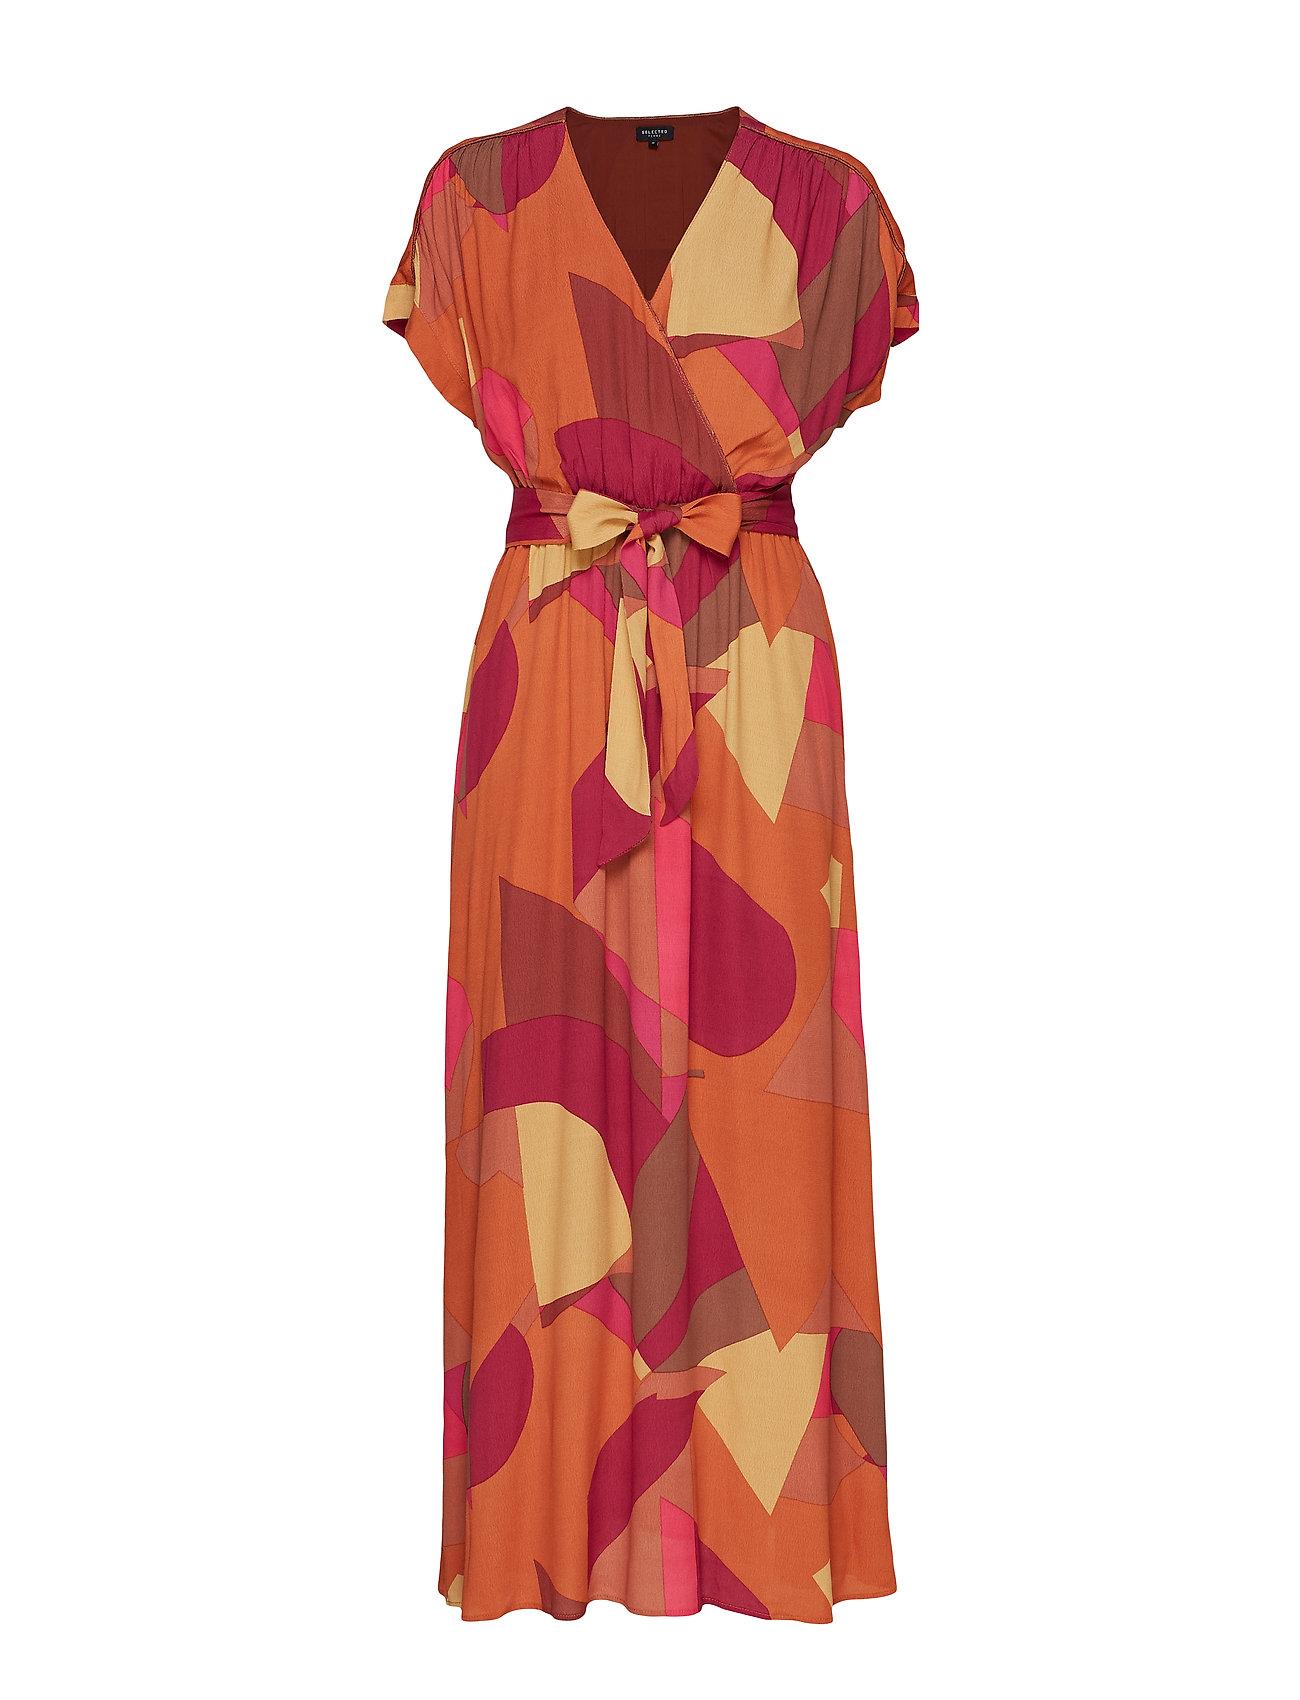 Selected Femme SLFWINNIE SL ANKLE DRESS EX - MANGO